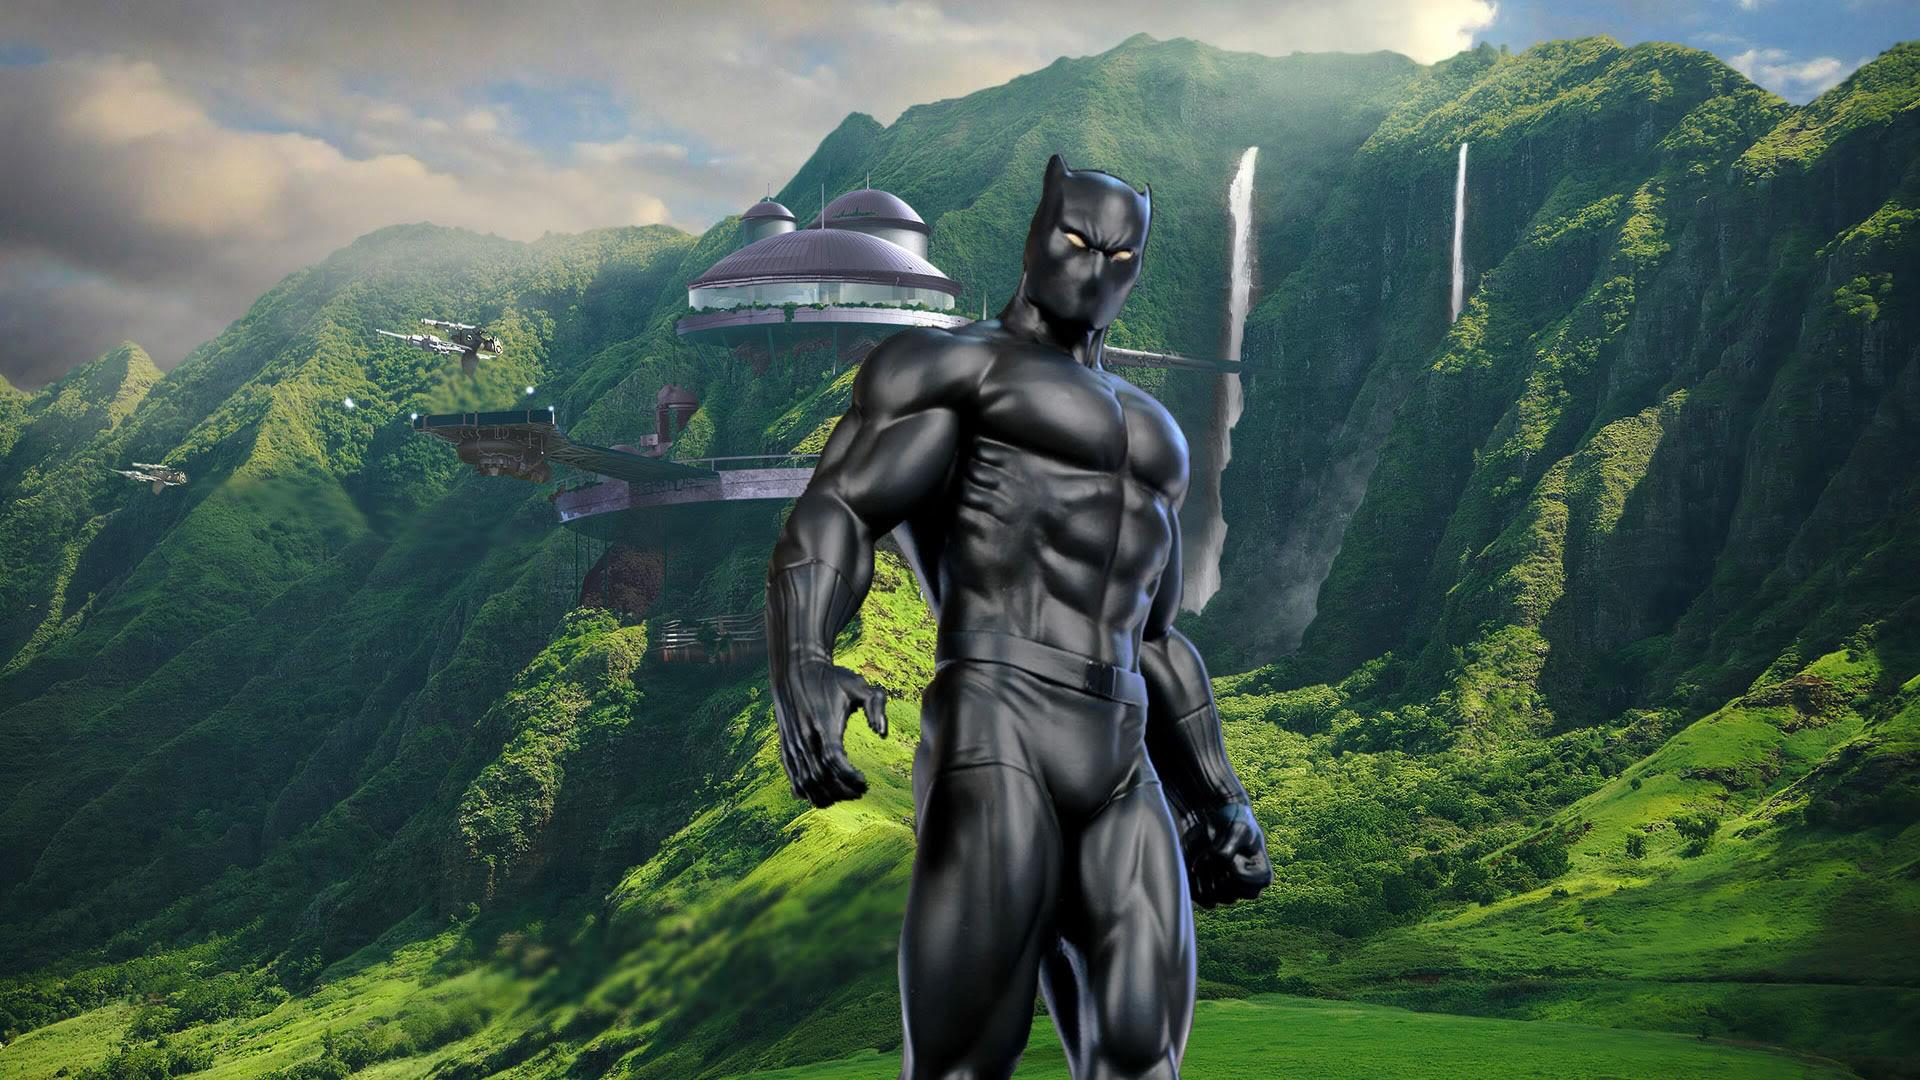 2017 Black Panther Desktop Background HD Wallpaper Search more high 1920x1080